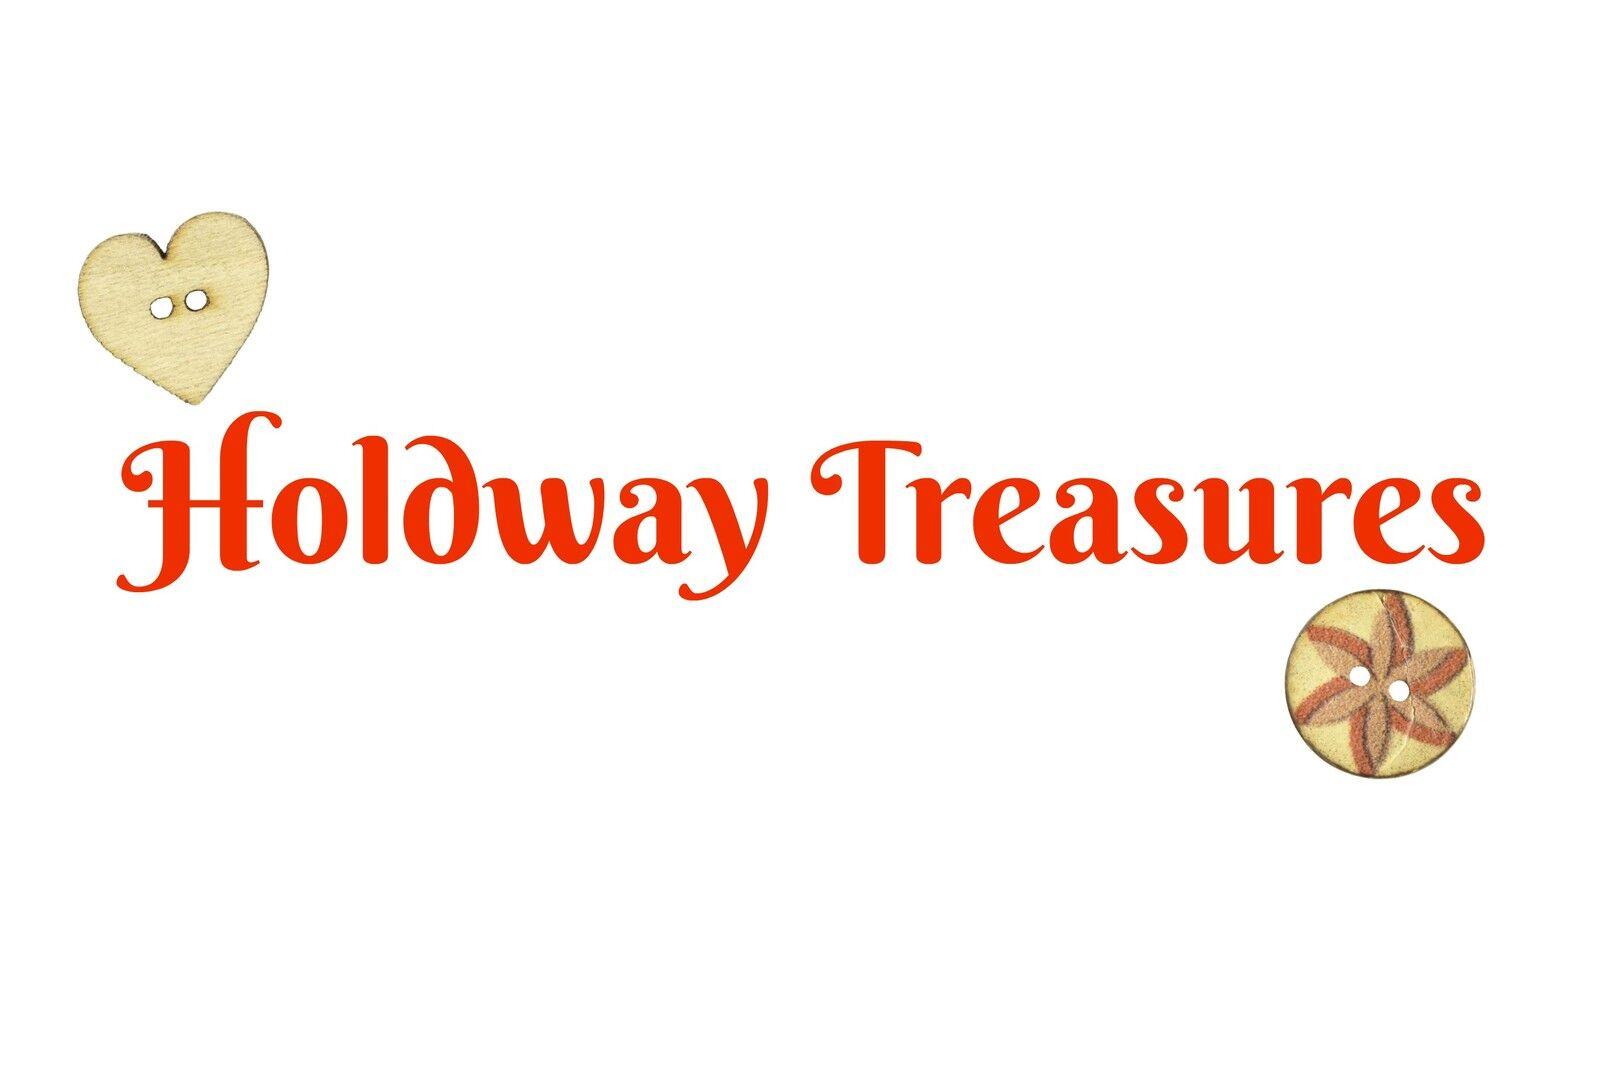 Holdway Treasures